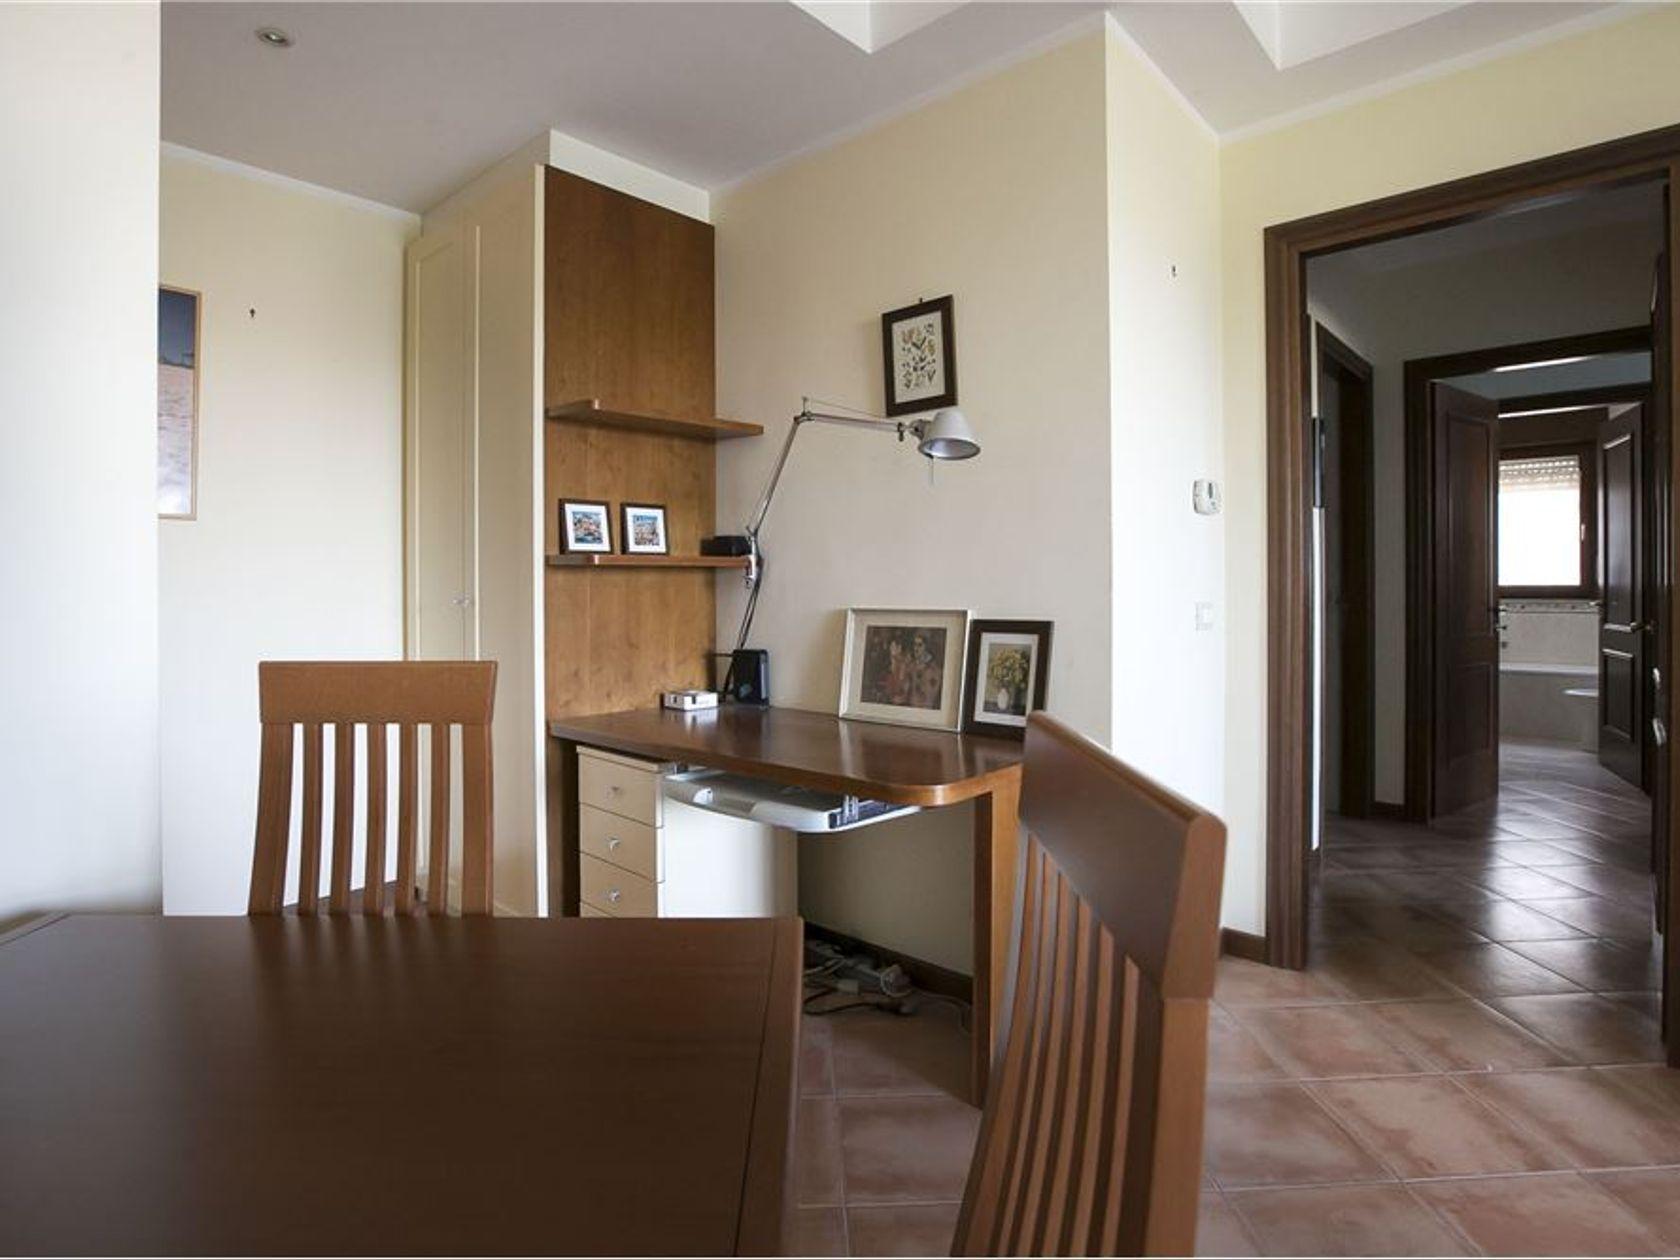 Appartamento Roma-acilia Vitinia Infernetto Axa Casal Palocco, Roma, RM Vendita - Foto 4